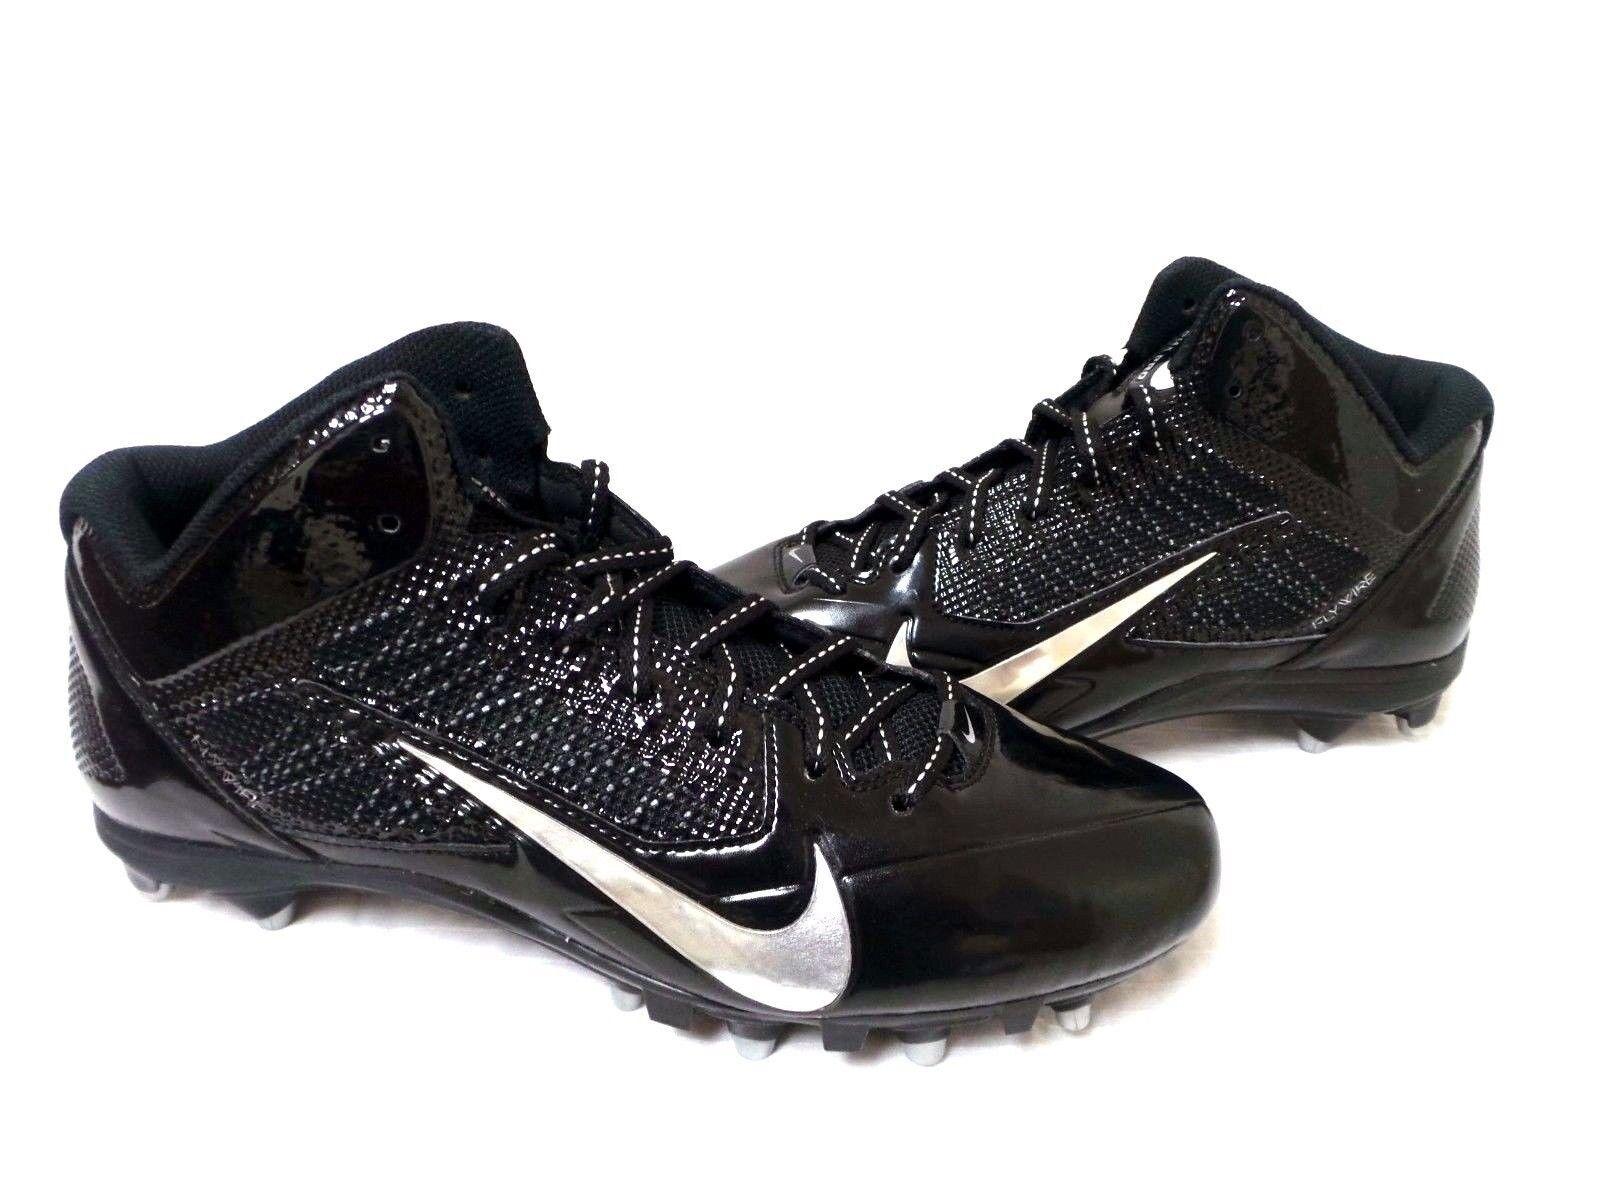 Men's Nike Alpha Pro 3/4 TD Football Cleats - Black/Silver - NIB!